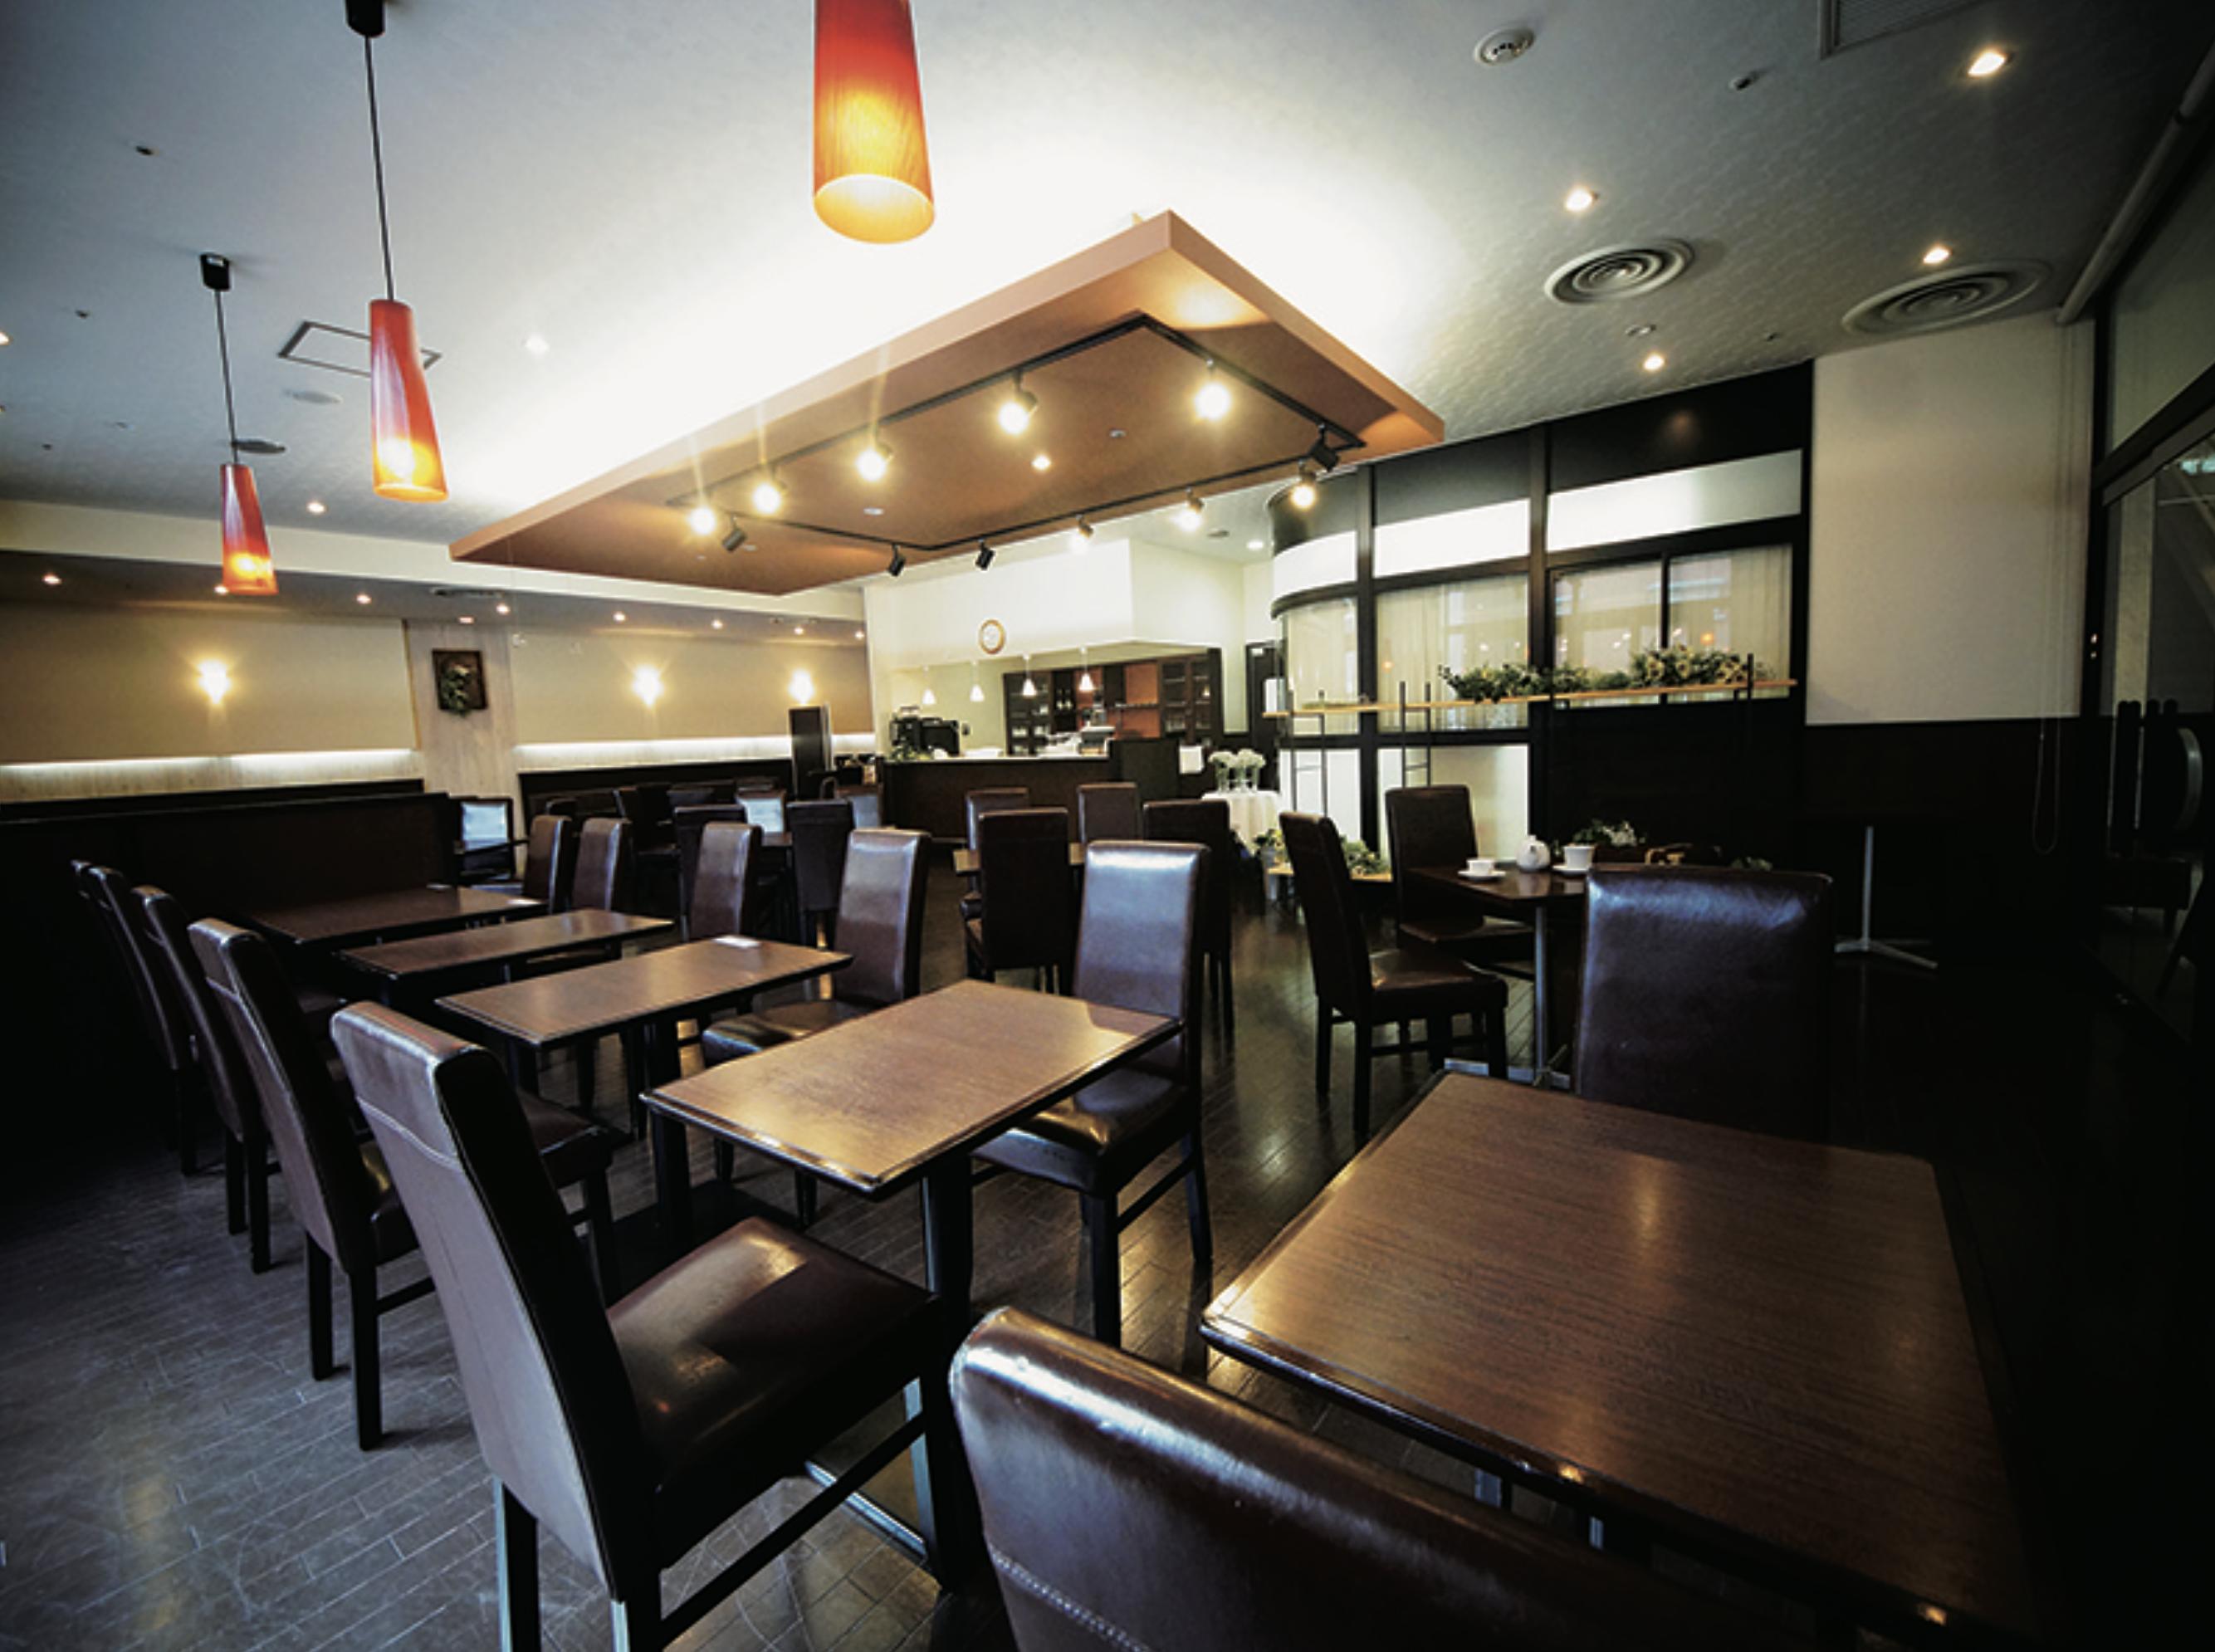 Cafe de Liente(カフェ ドゥ リアンテ)